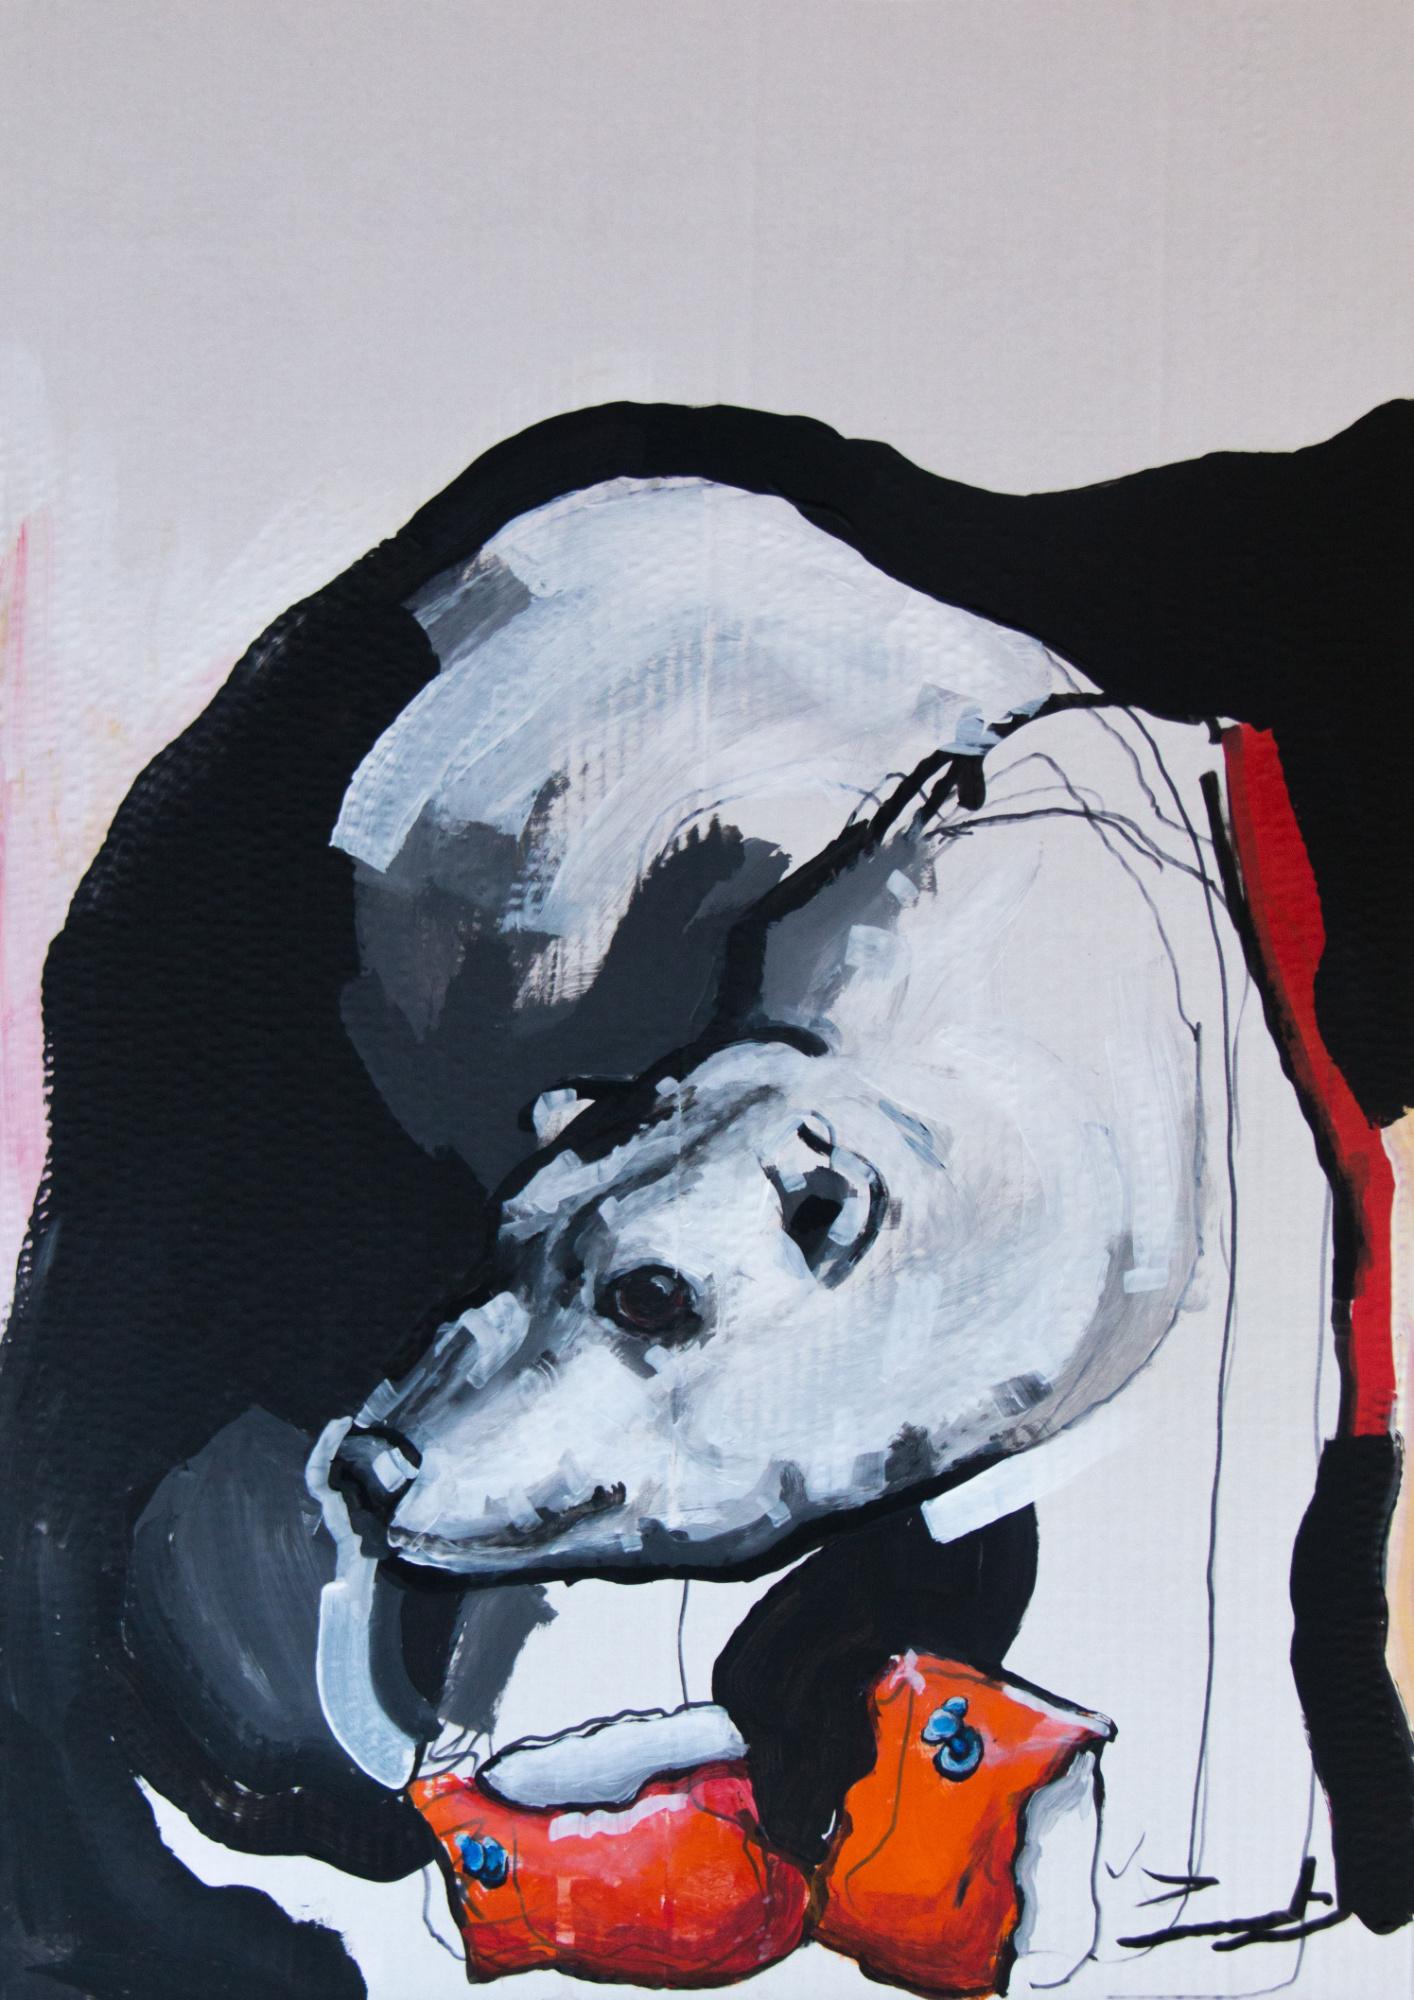 Der Eisbär, 50x70cm, Marc Allgaier, 2020